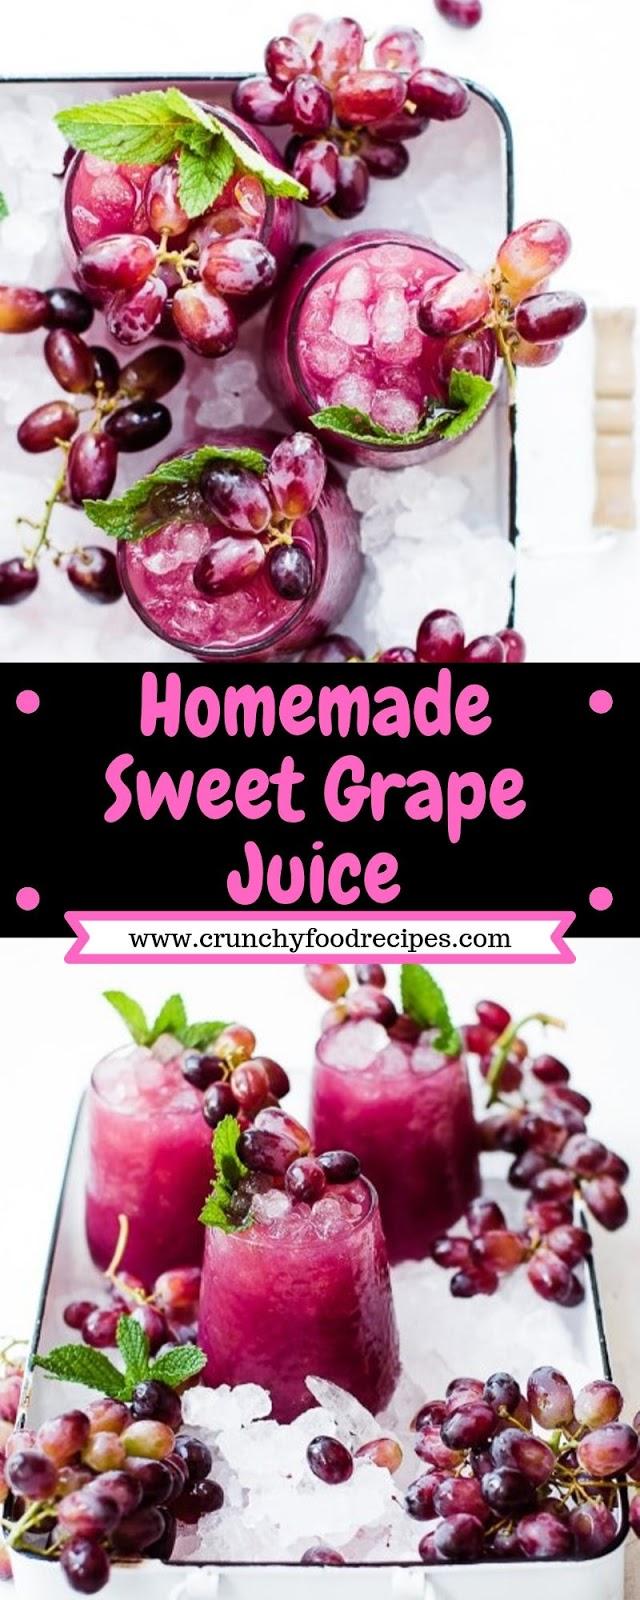 Homemade Sweet Grape Juice